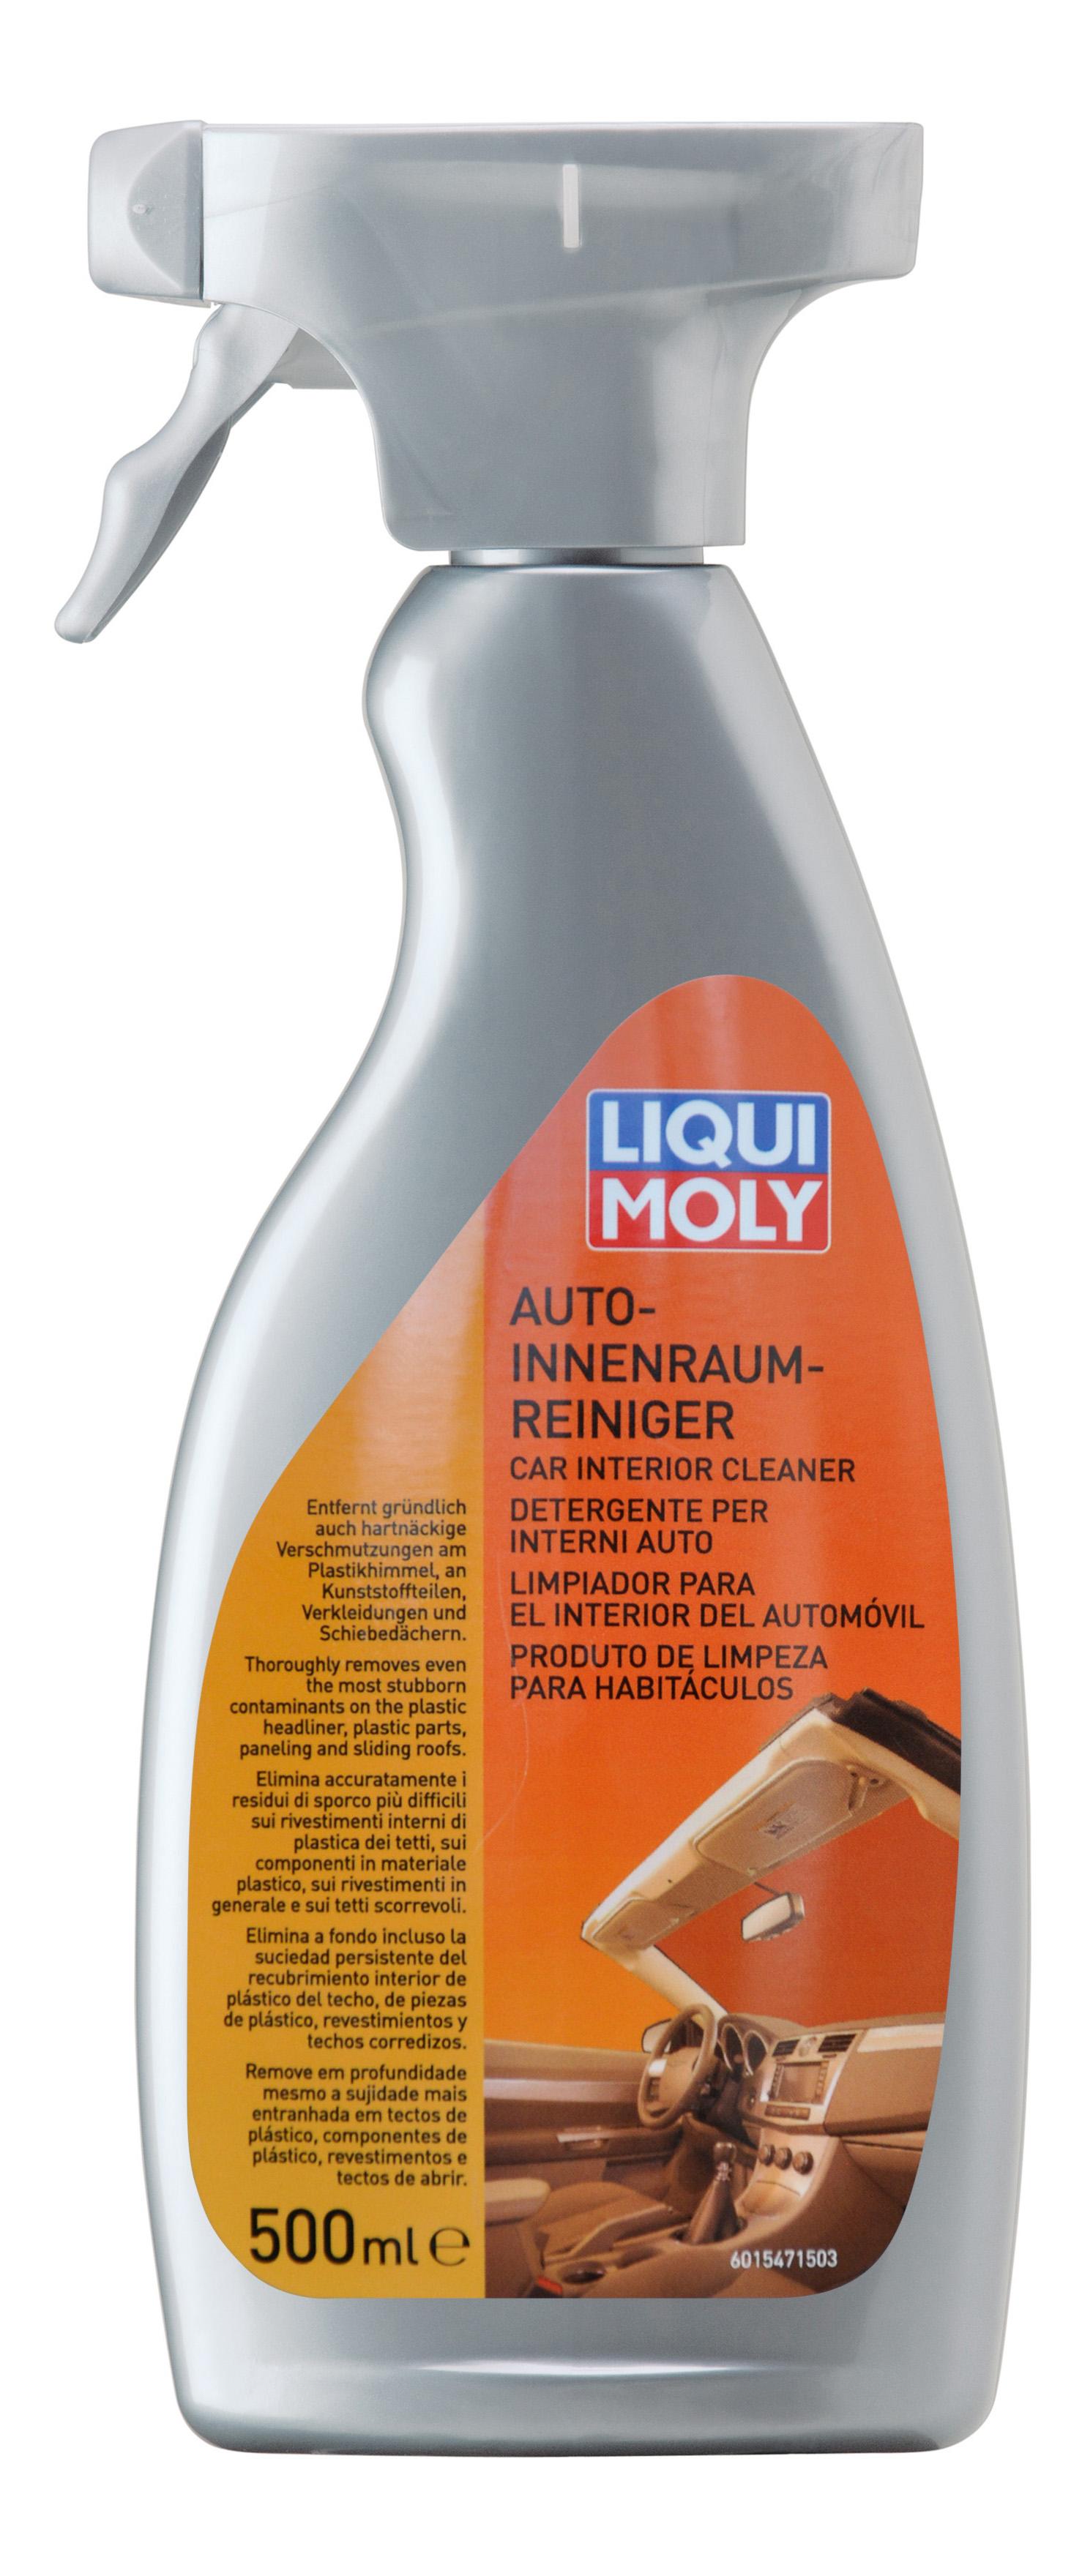 Средство для очистки салона автомобиля LIQUI MOLY Auto-Innenraum-Reiniger (1547) фото